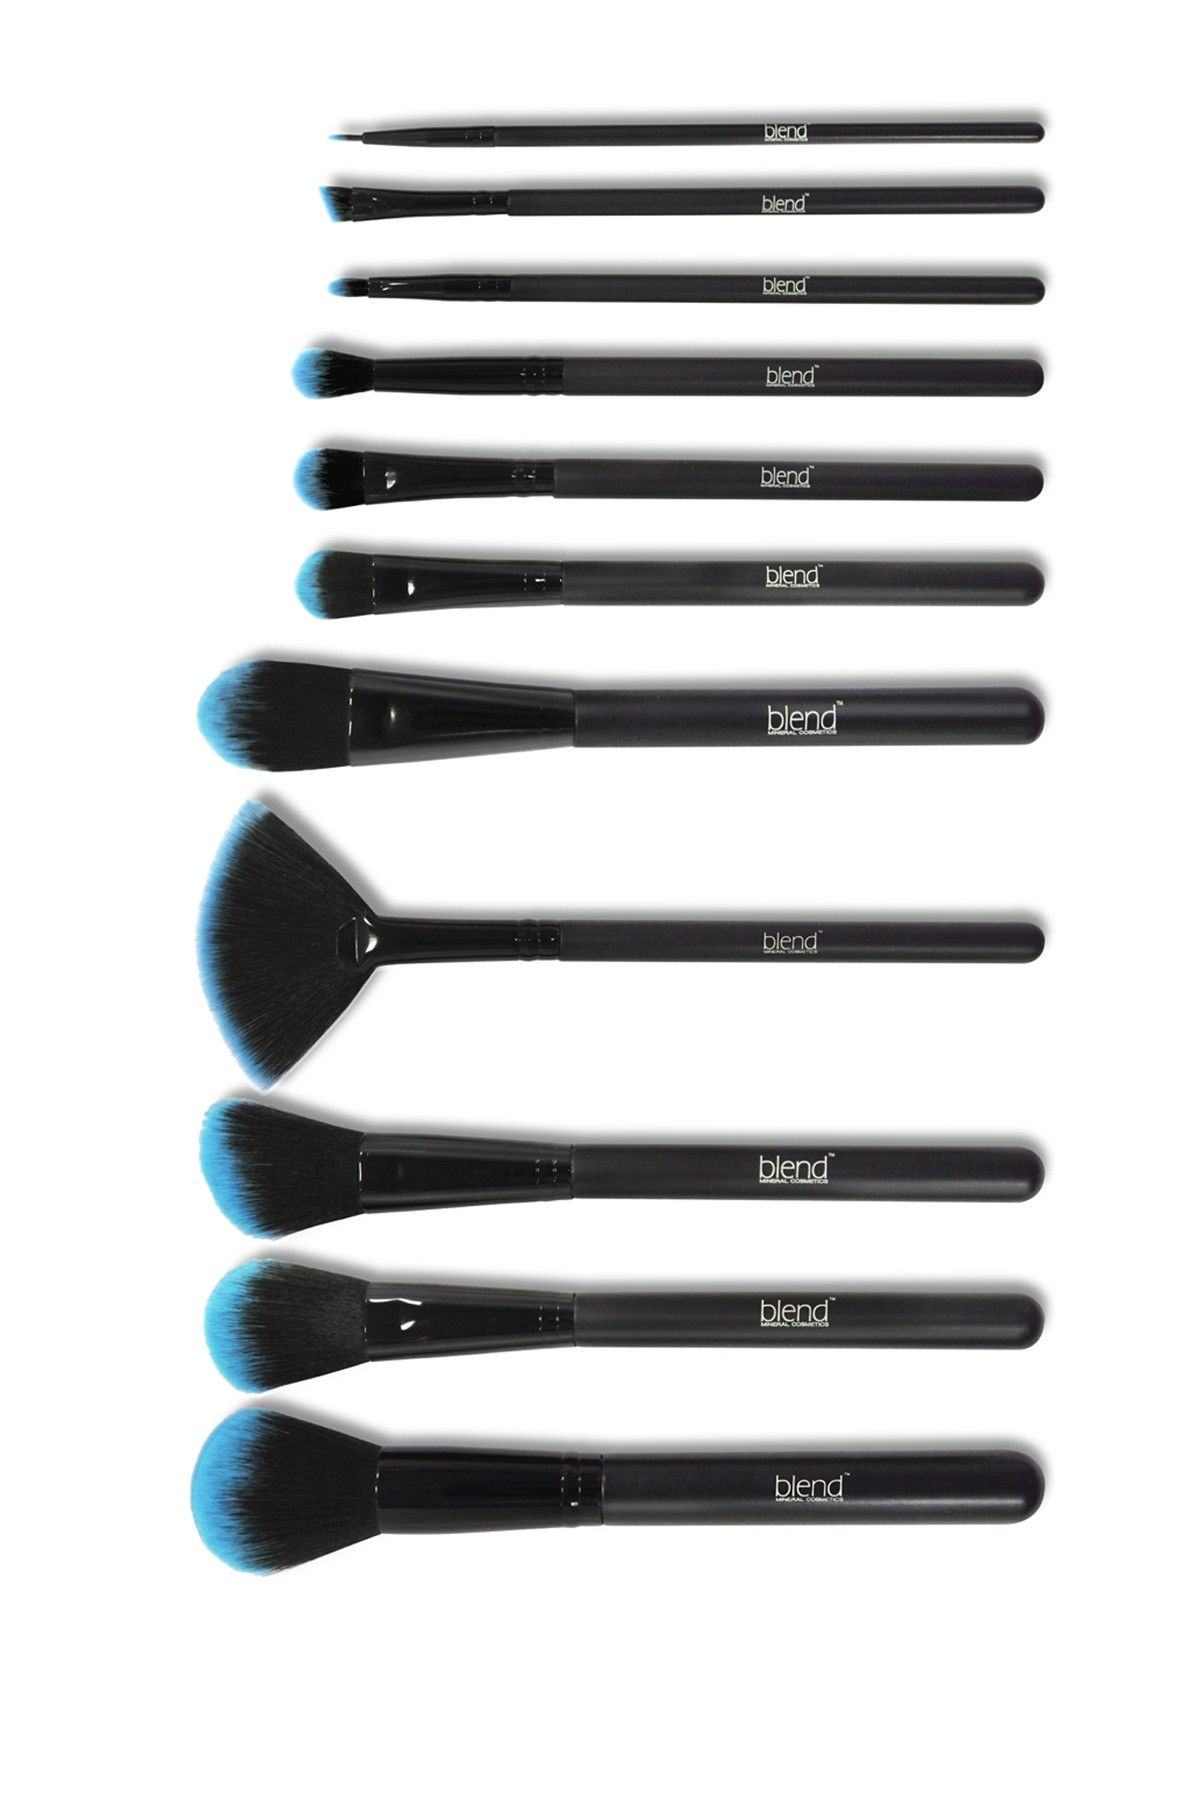 Idea - Paint Makeup Brush | Pinner said: Deluxe Brush Set ...